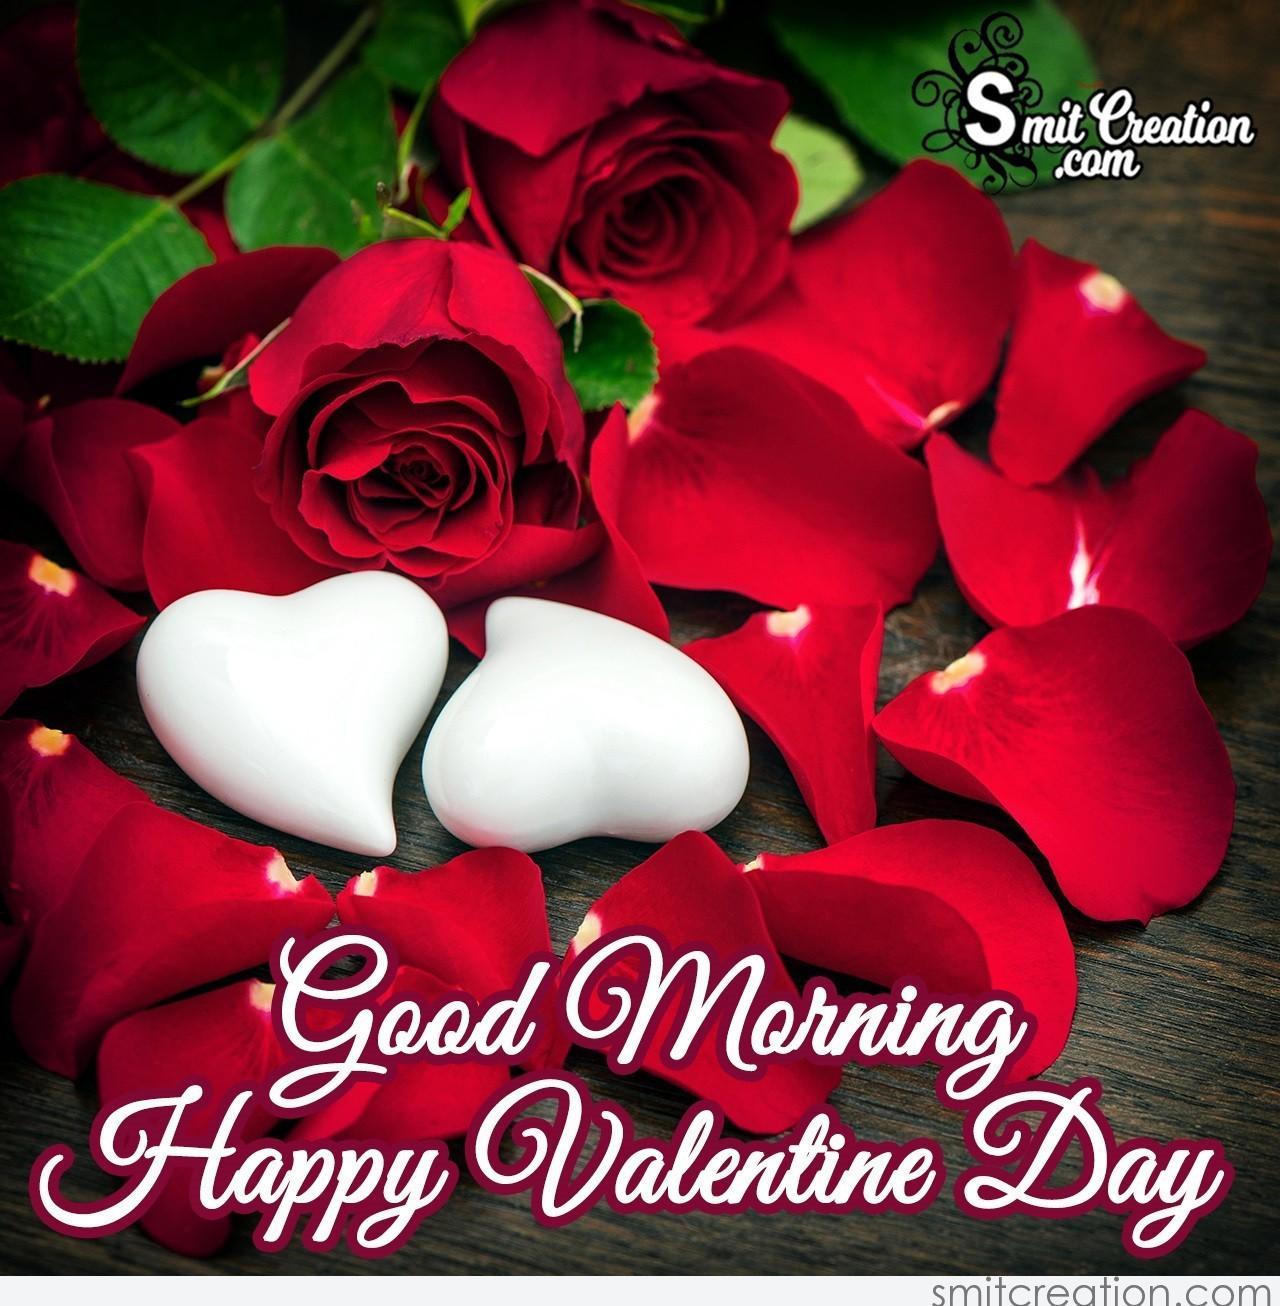 Good Morning Valentine's Day Love Image